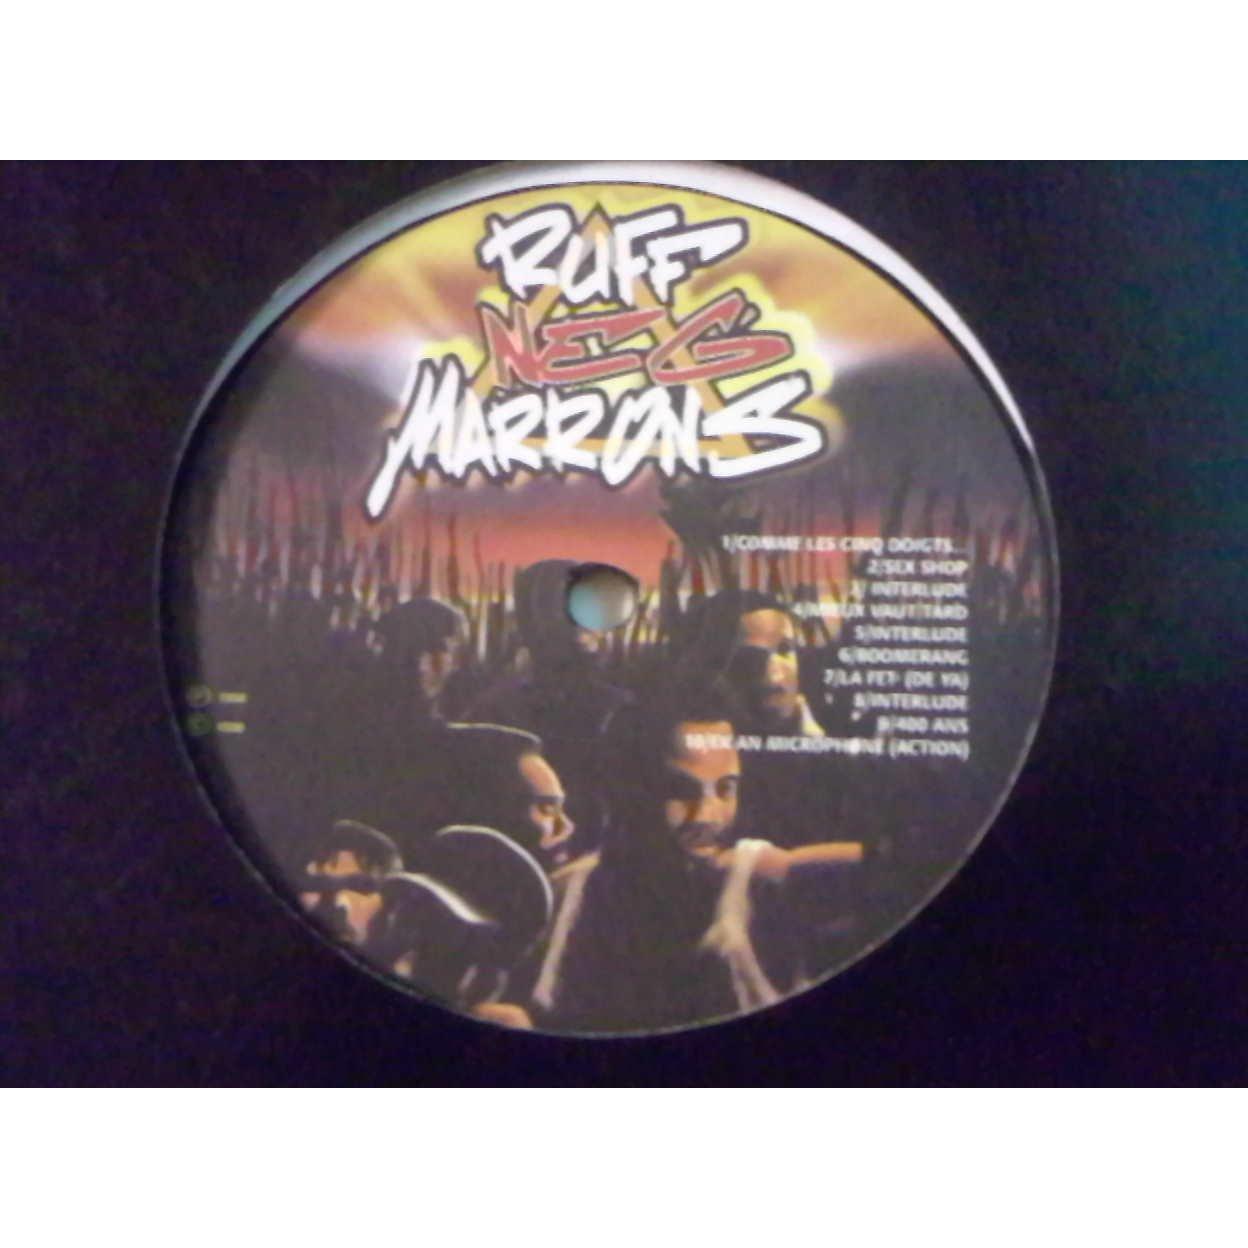 Ruff Neg'Marrons - Comme Les Cinq Doigts...